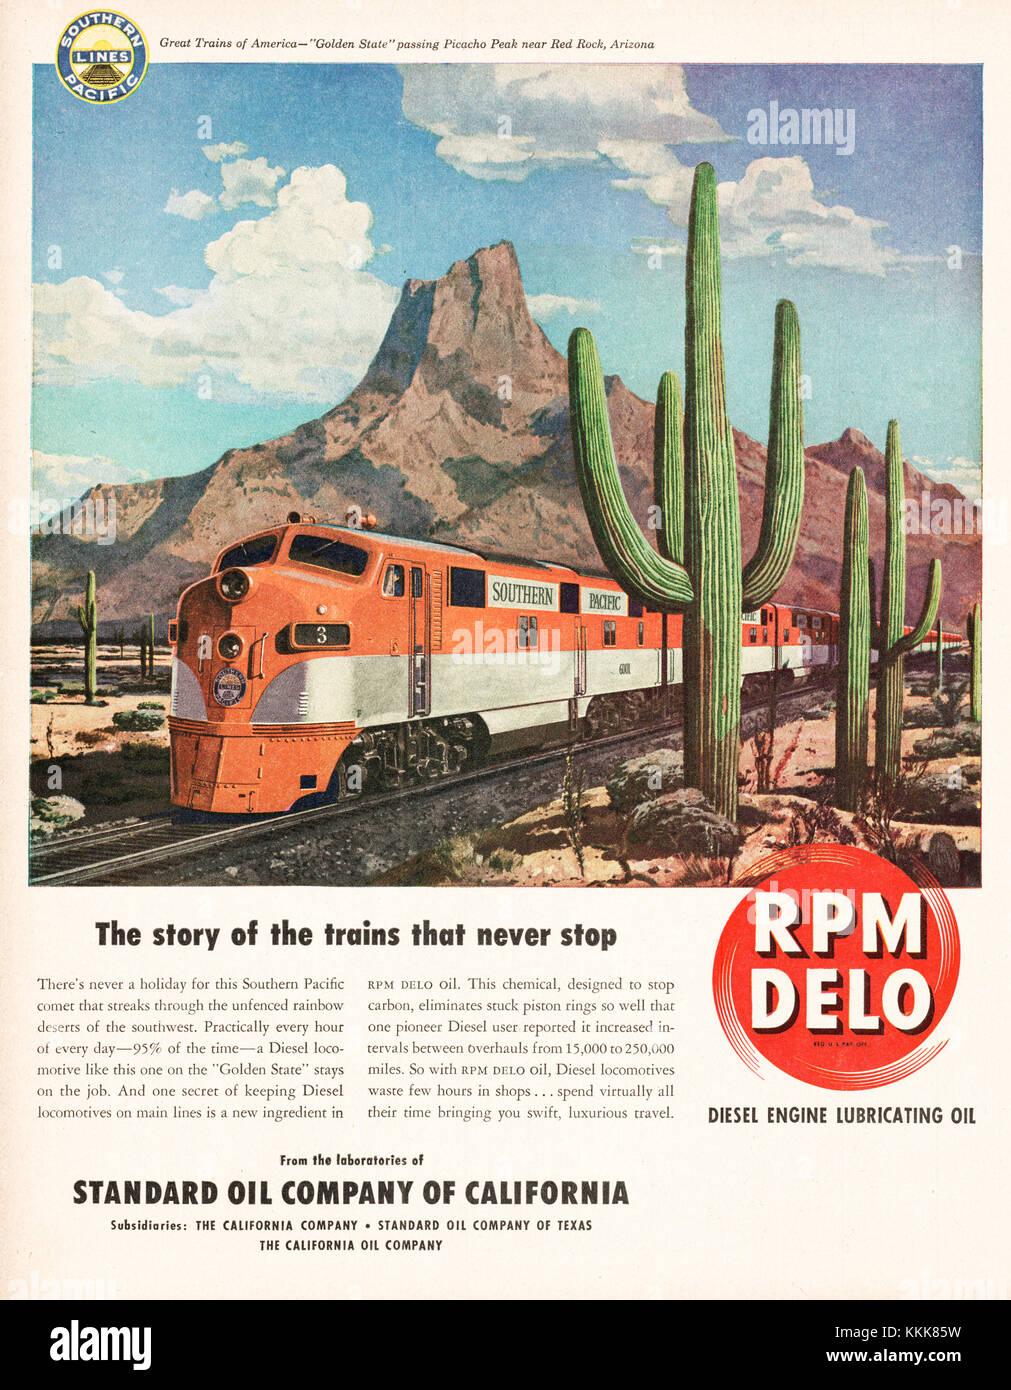 1948 U.S. Magazine RPM Delo Engine Oil Advert - Stock Image